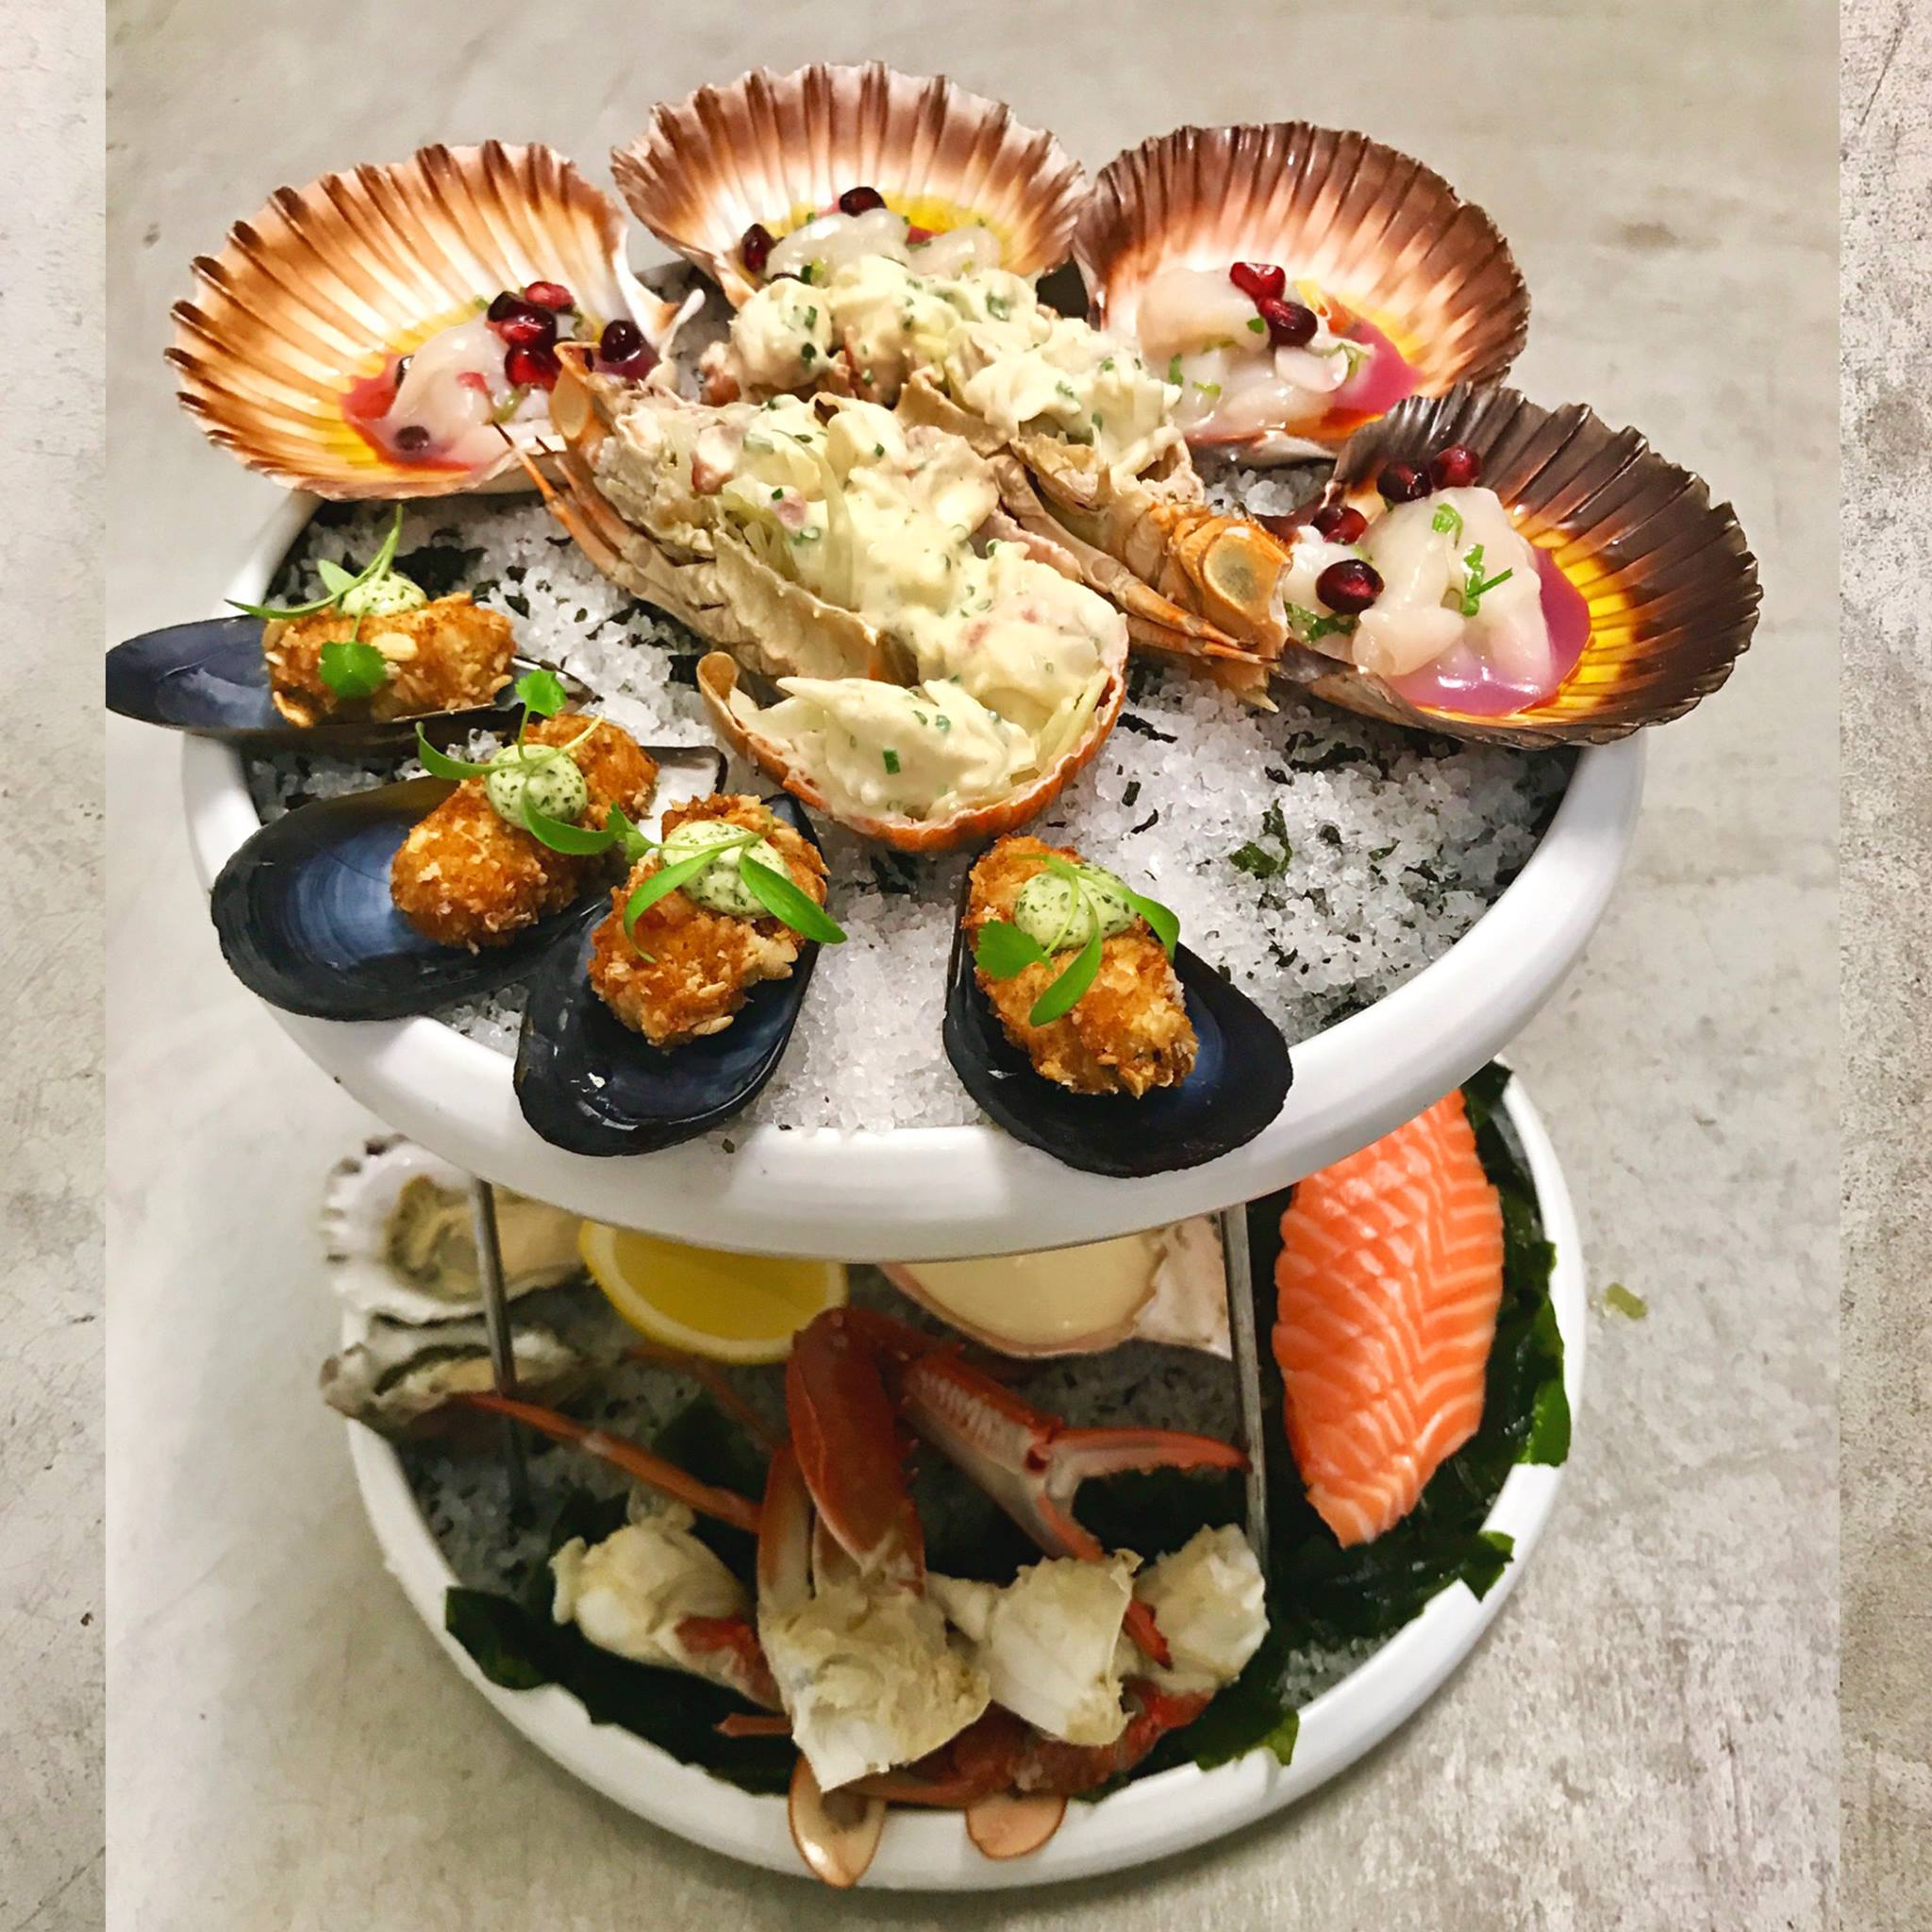 Seafood platter menu item at Cirrus Dining restaurant, Barangaroo